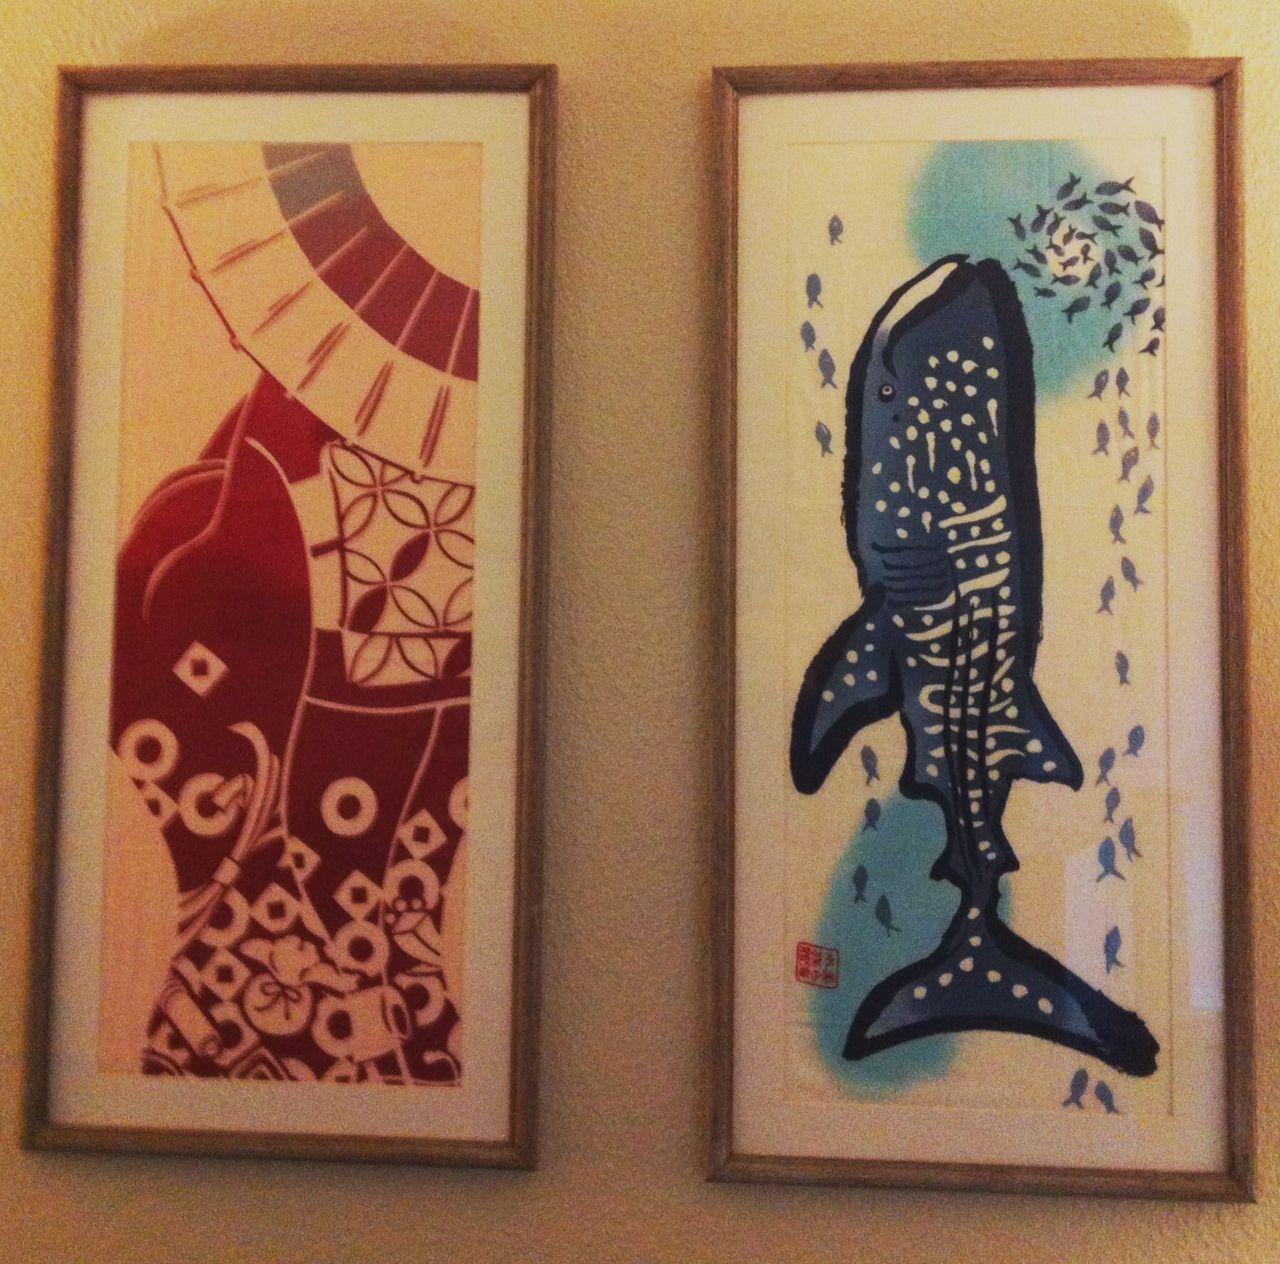 Travel Towel Japan: Framed Tenugui From Trip To Japan